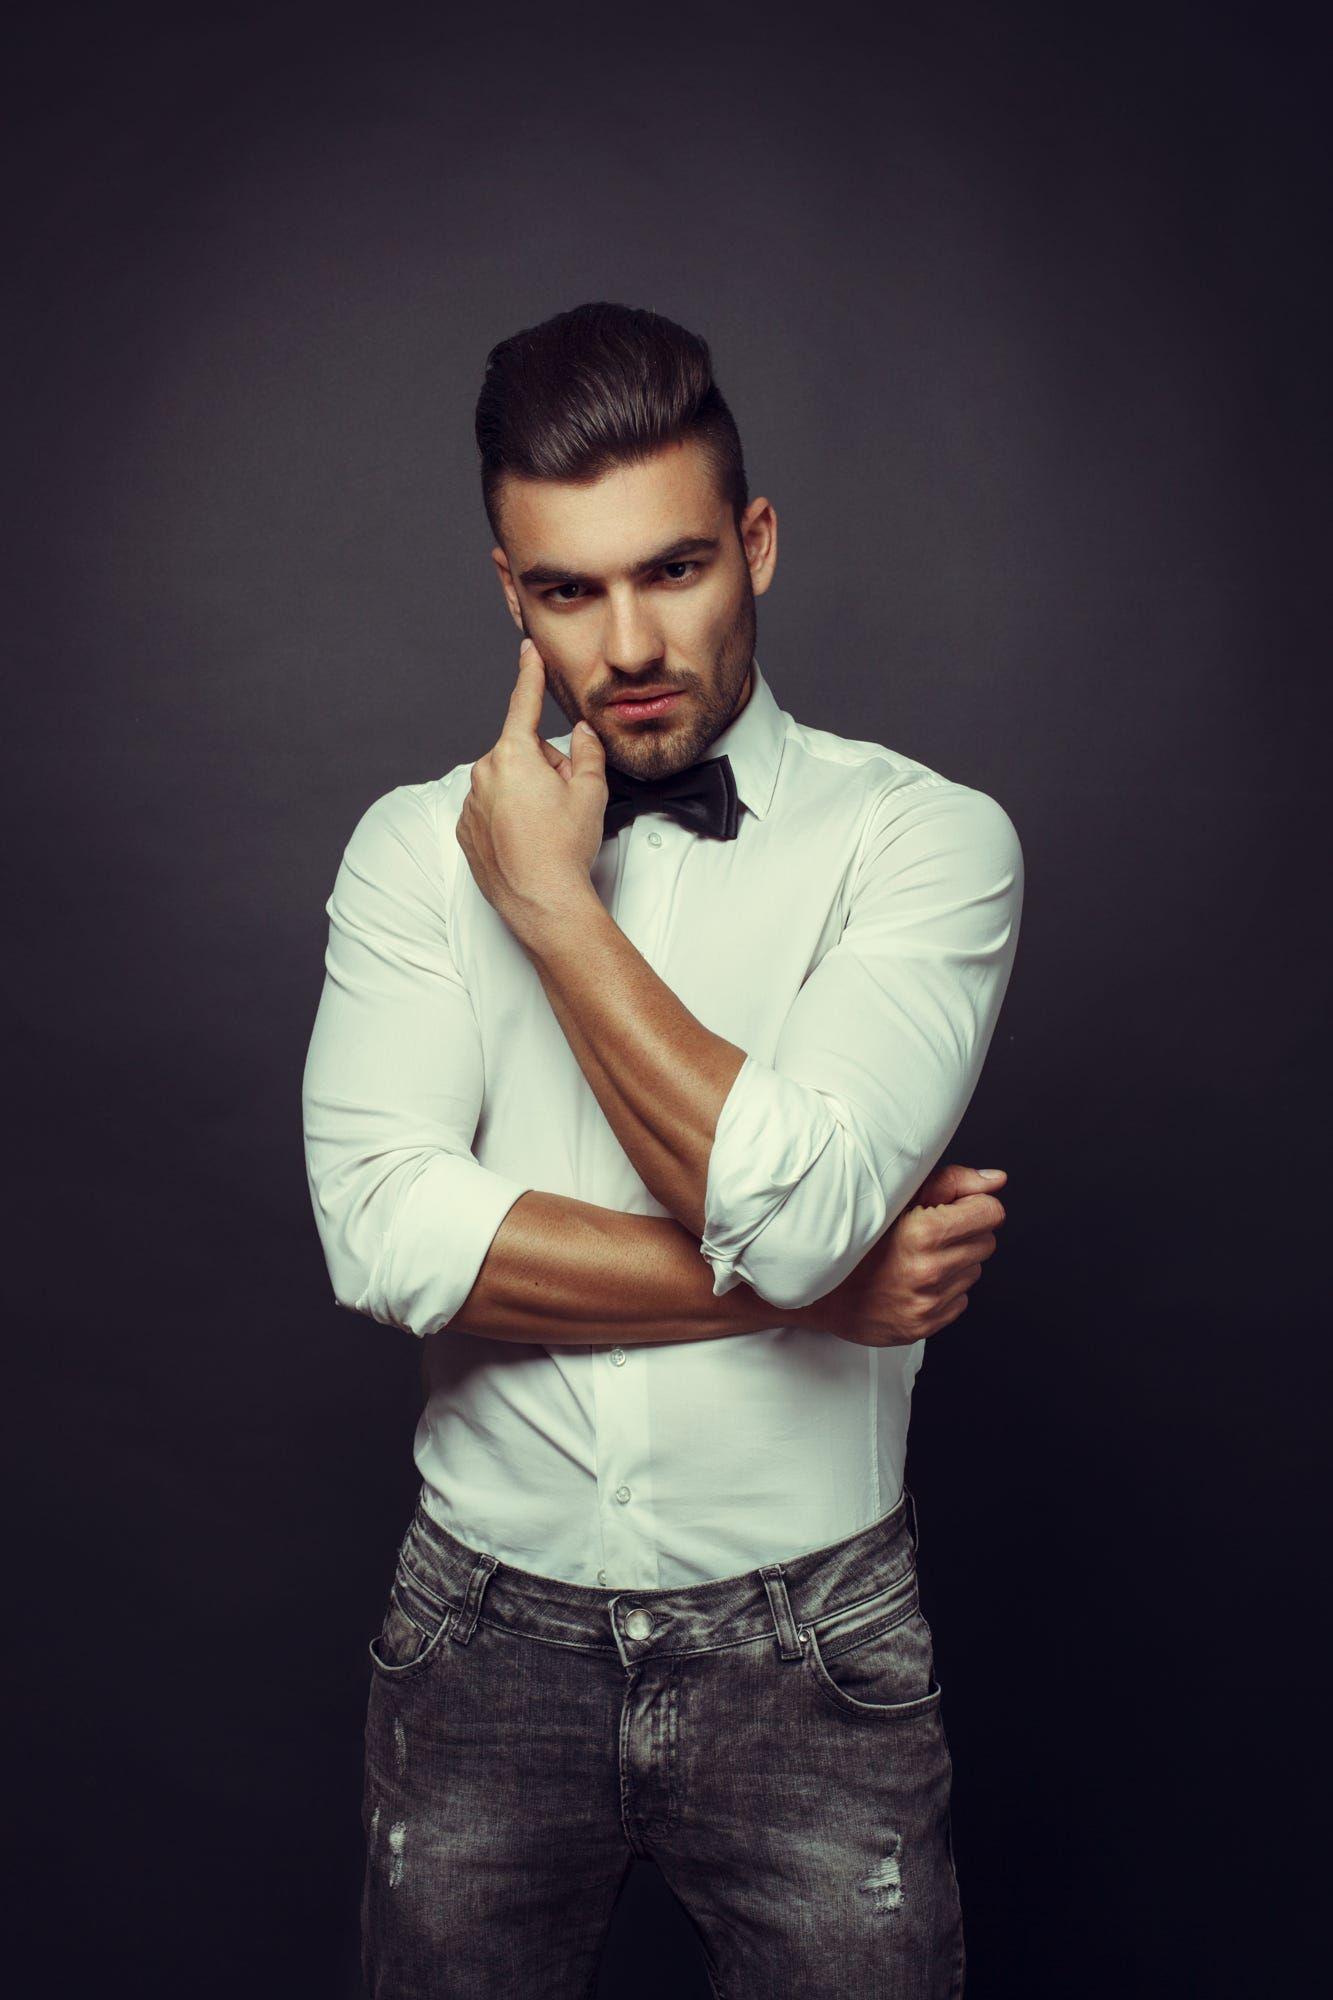 Free photo: Man posing - Adult, Lifestyle, Look - Free ...